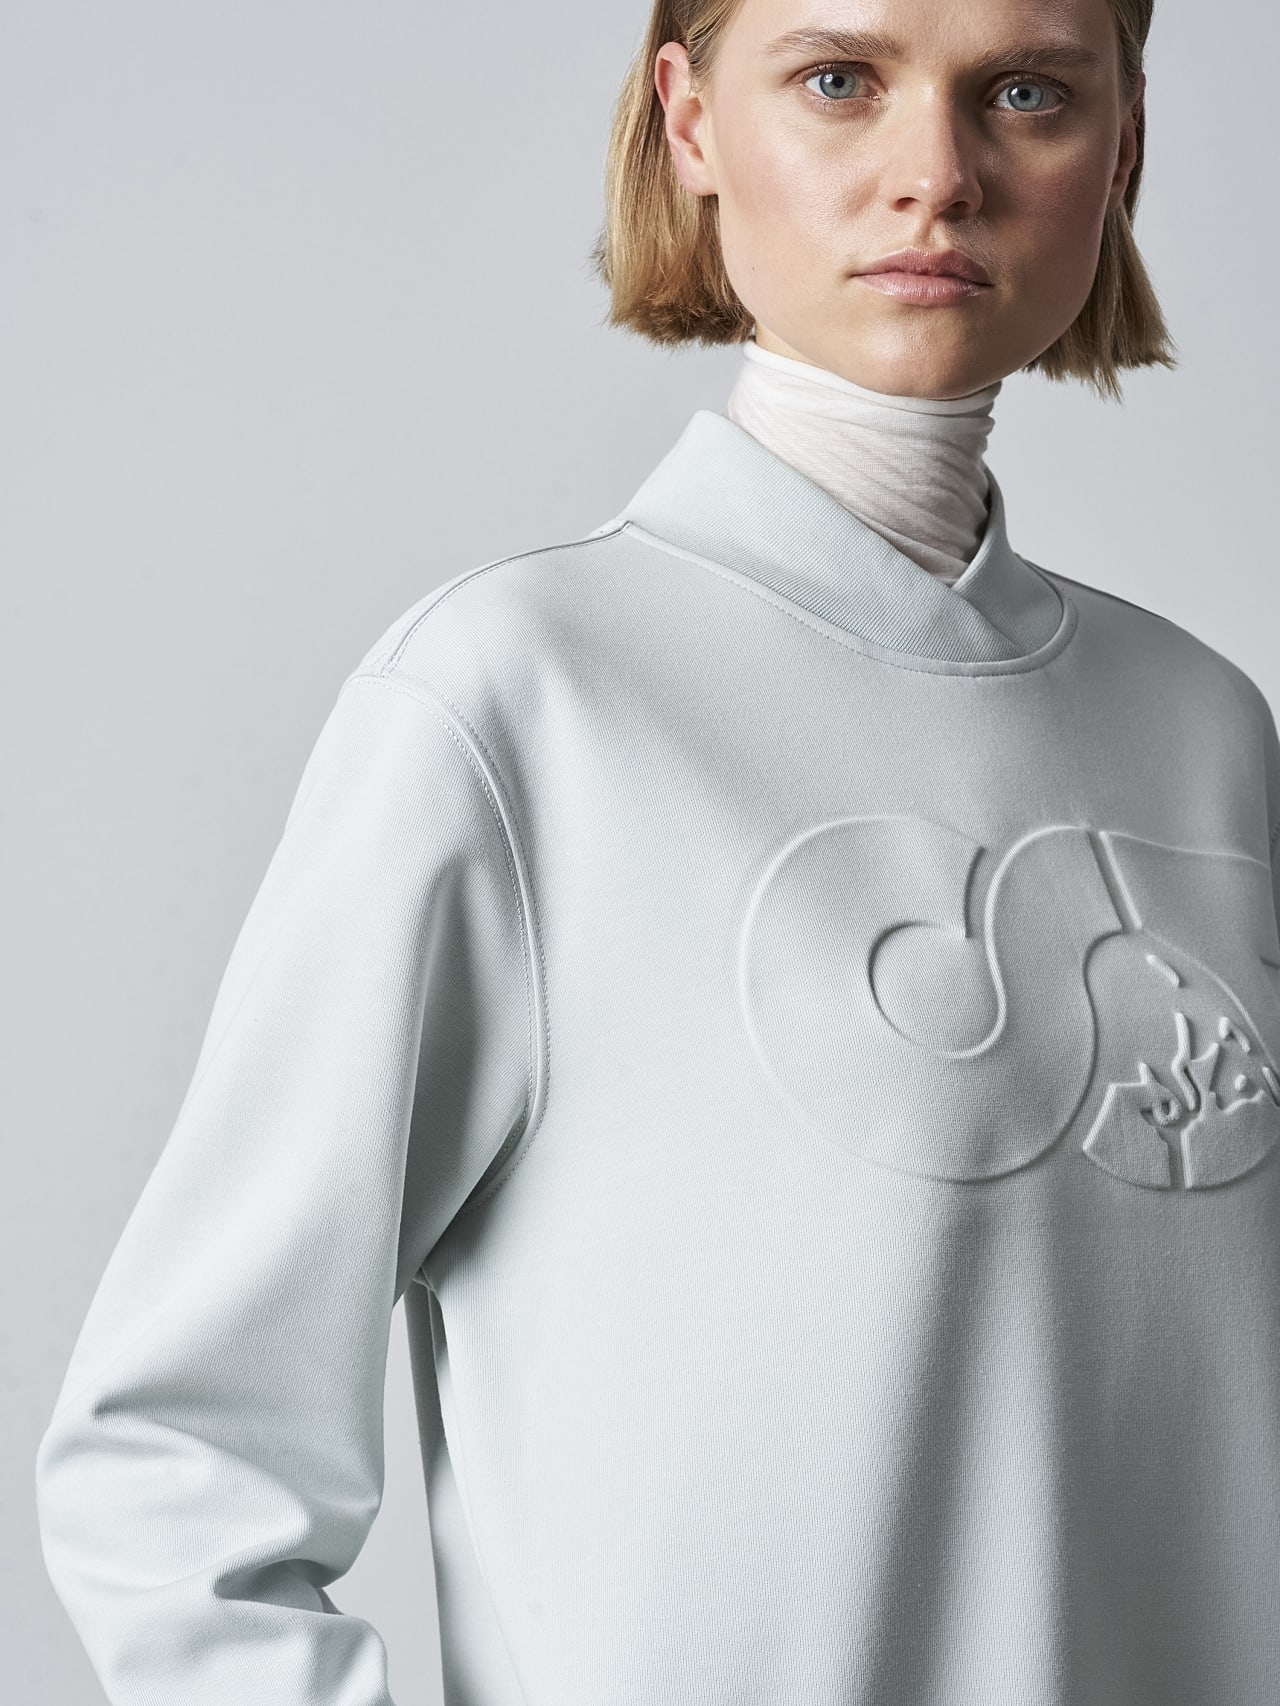 STAR V3.Y5.02 Premium Logo Sweater Dress Pale Blue  Right Alpha Tauri